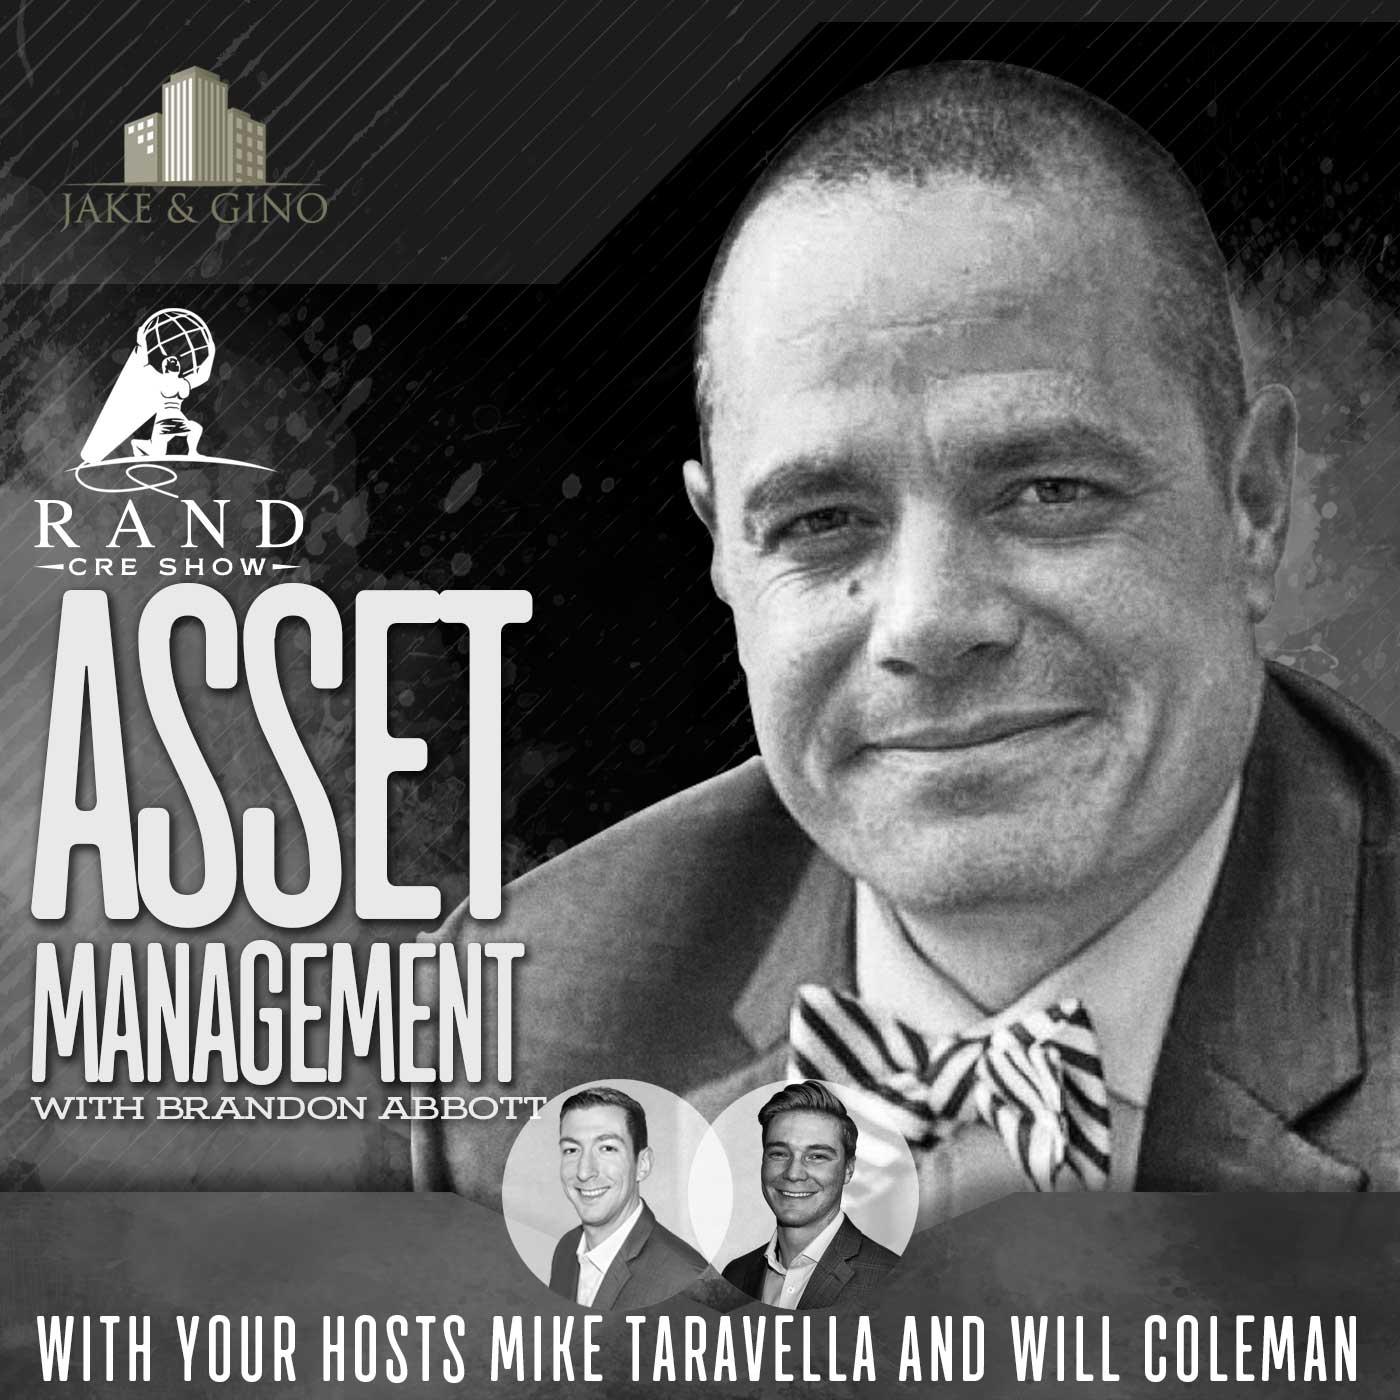 RCRE - Asset Management with Brandon Abbott